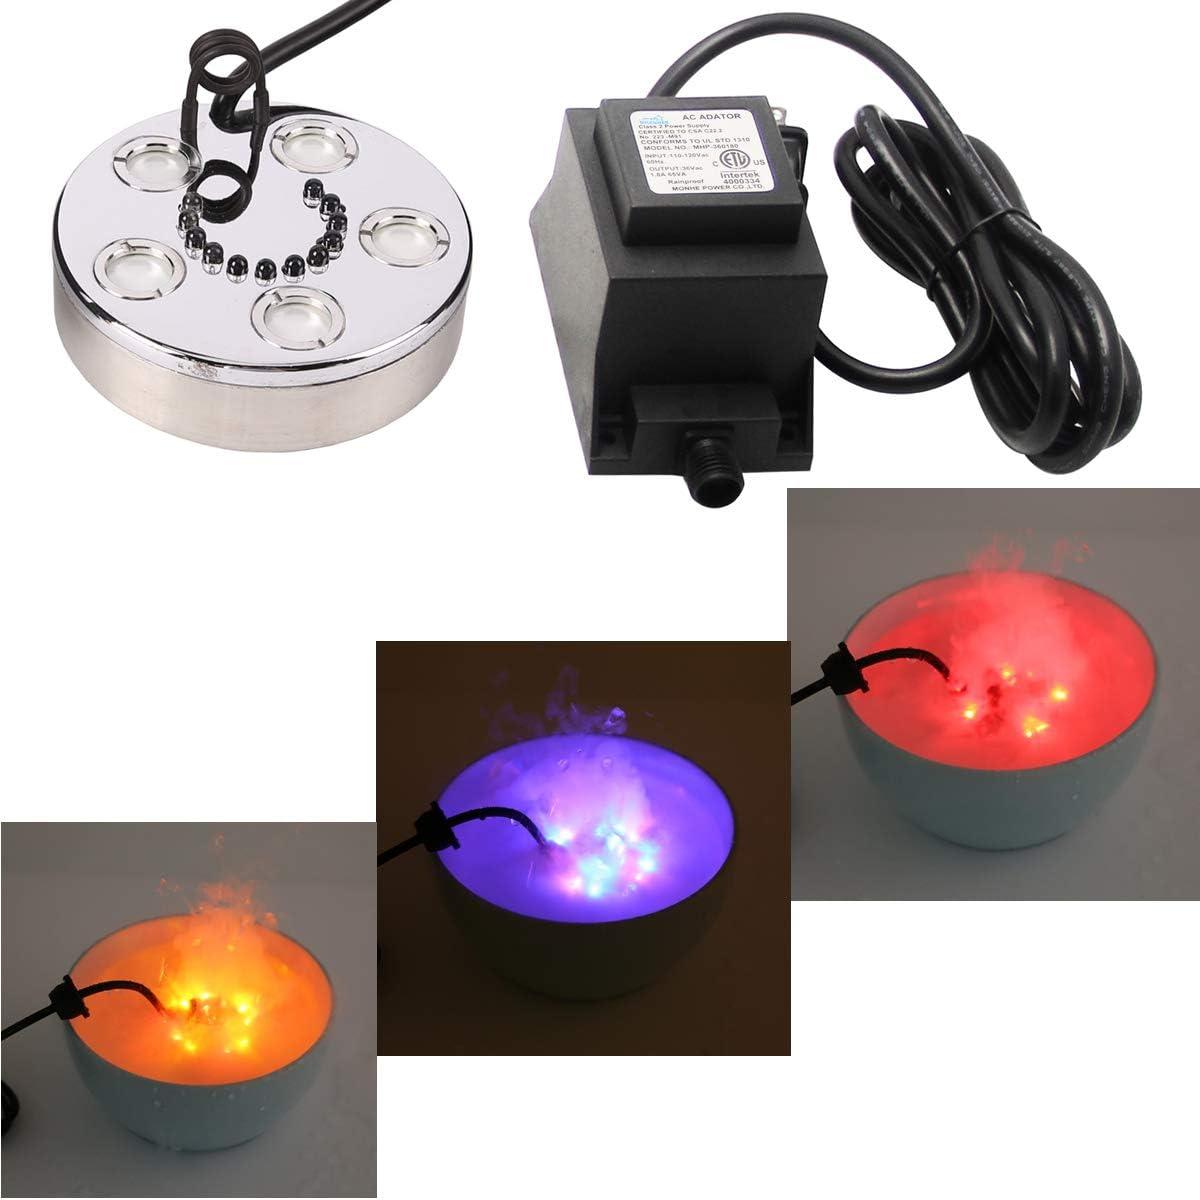 Hanchen Ultrasonic Mist Maker 1500MLH Industrial Humidifier